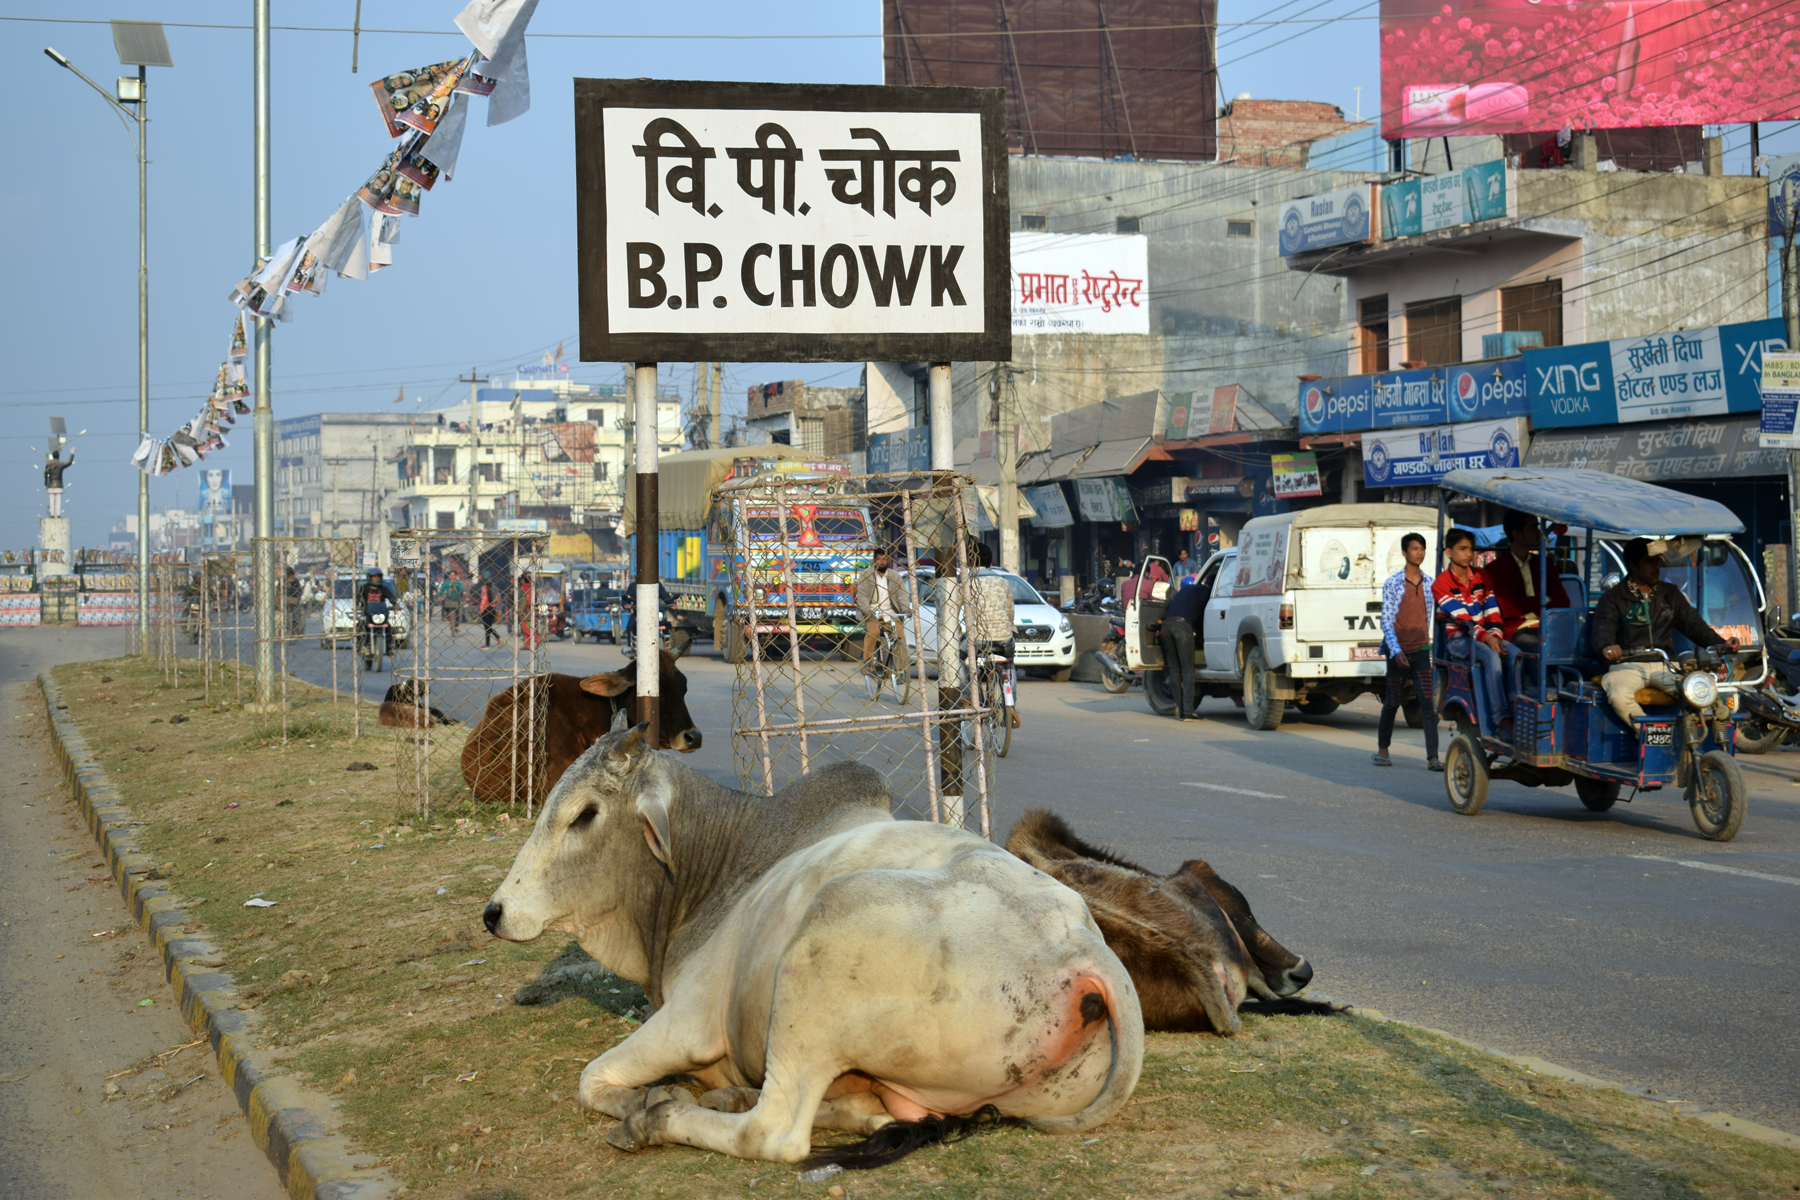 नेपालगन्जका चोकचोकमा छाडा चौपाया, नागरिकलाई सास्ती